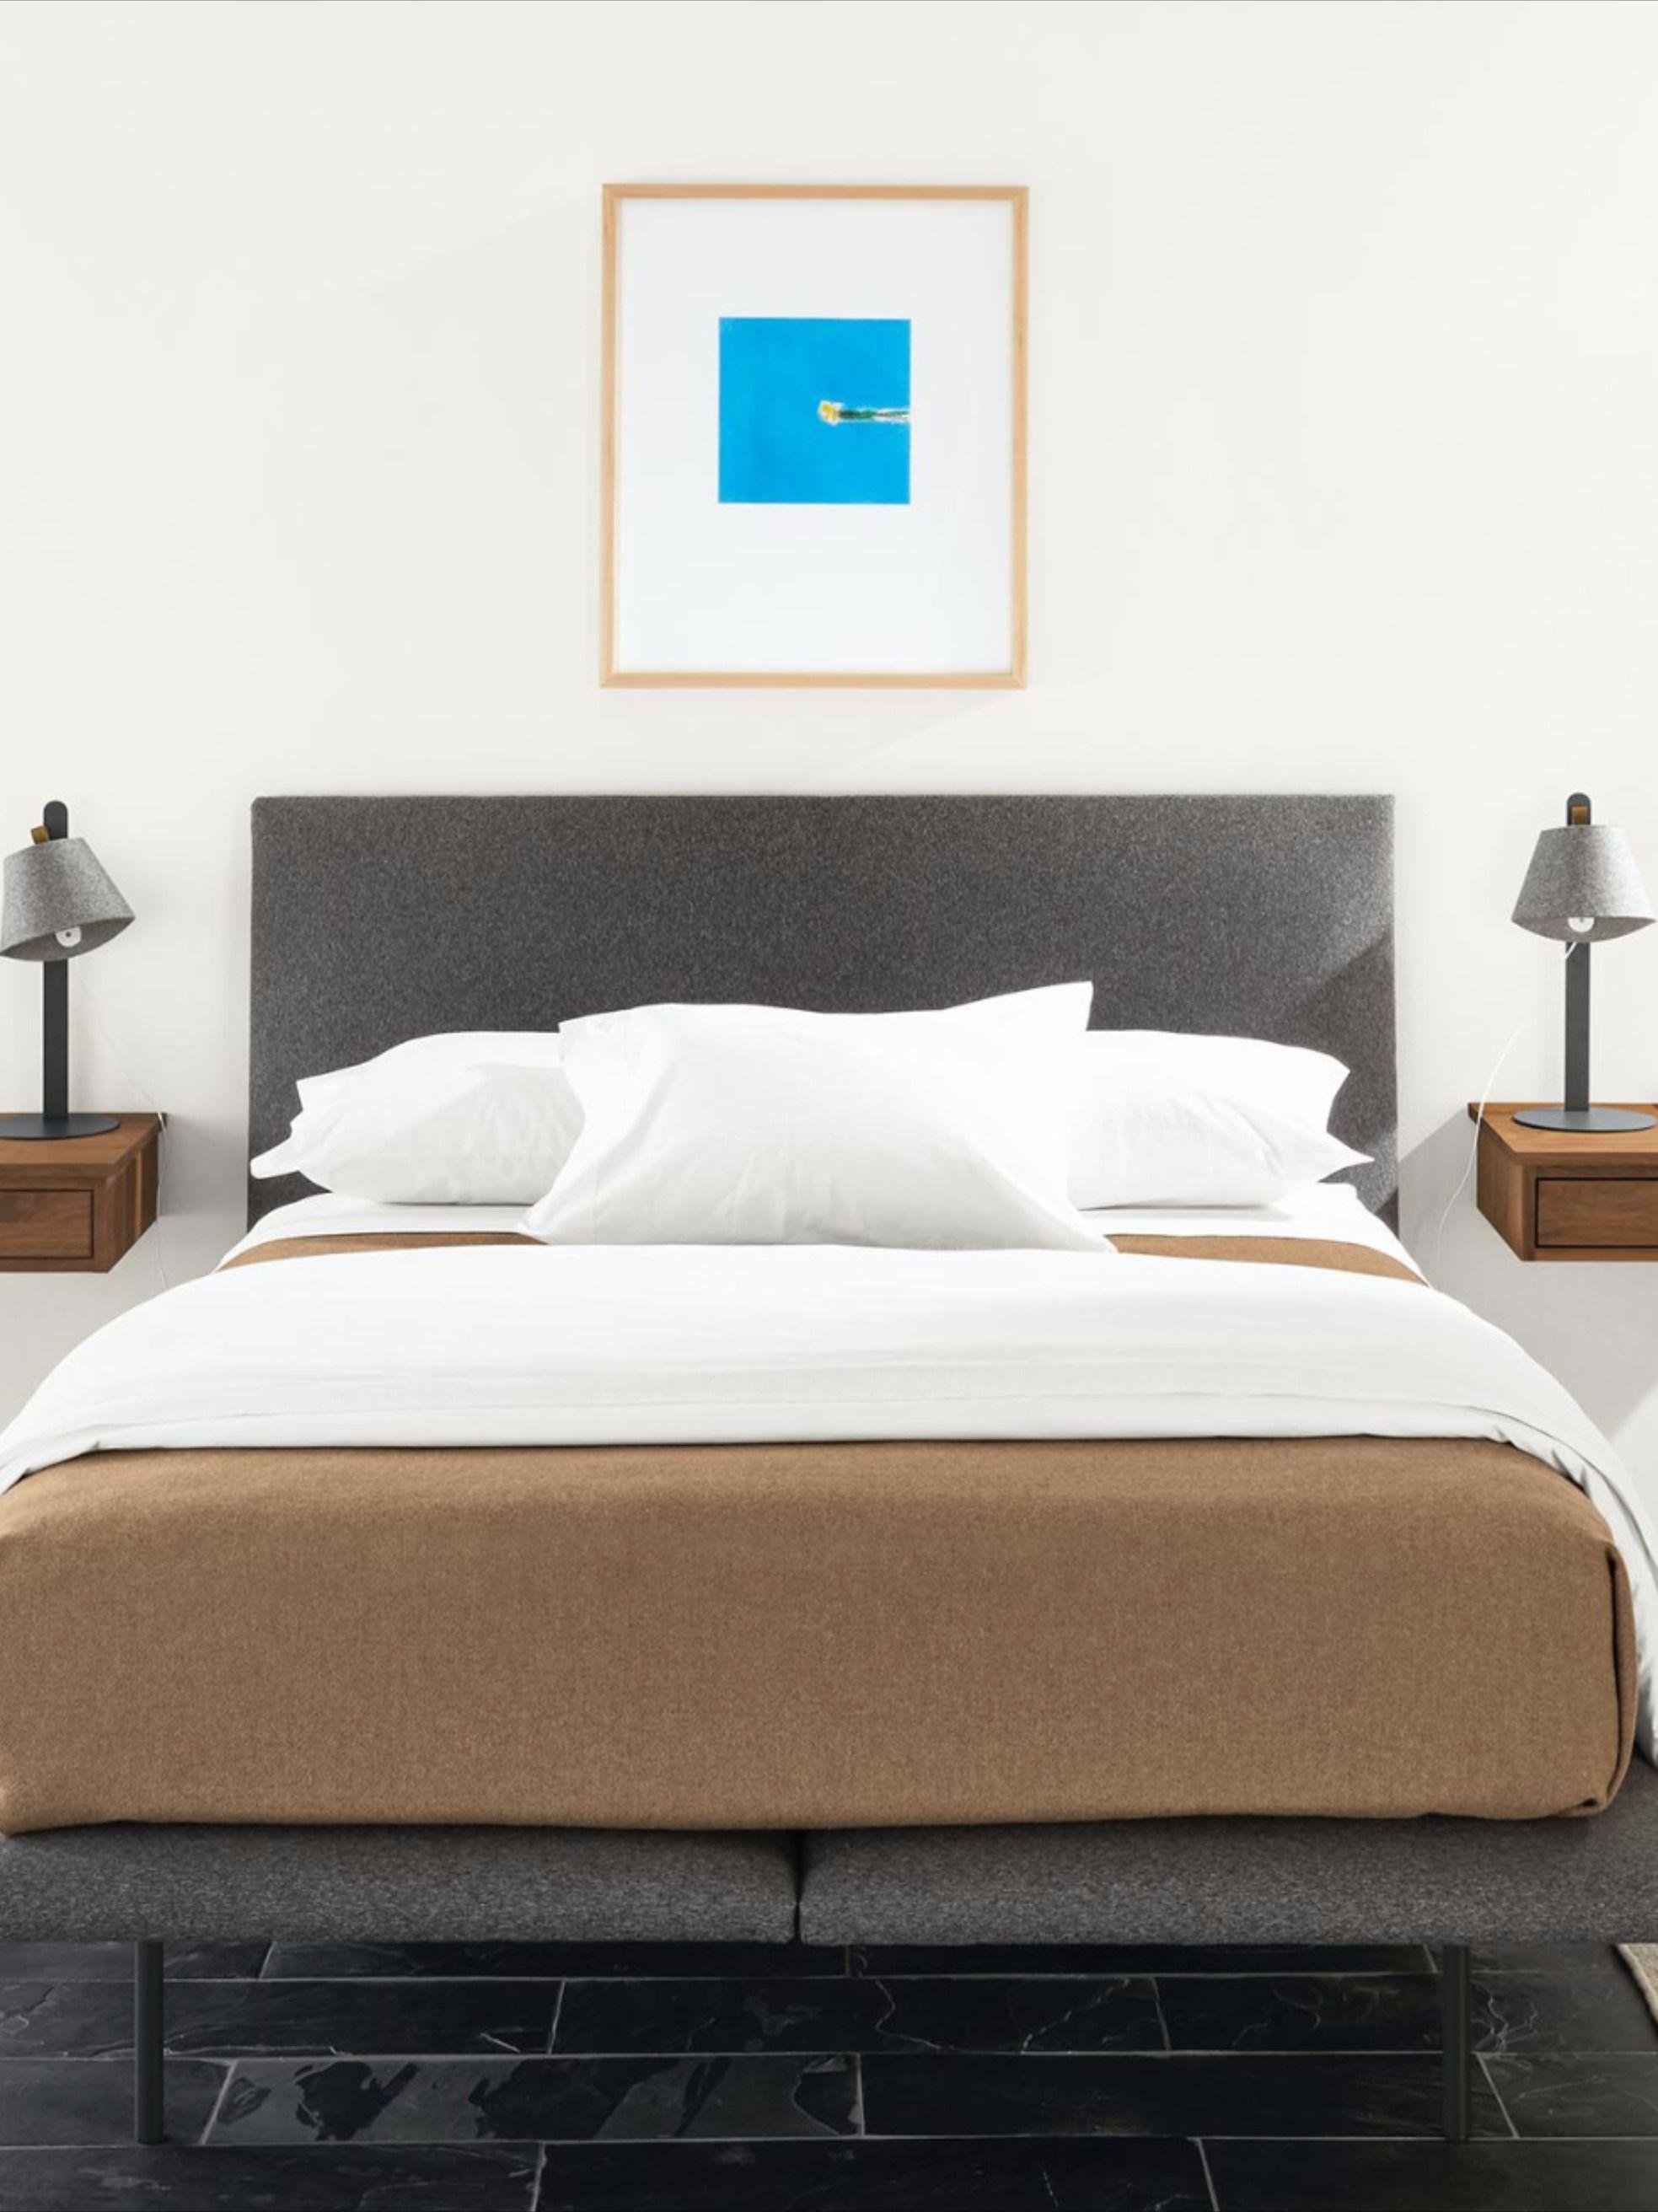 Hanson Bed - Modern & Contemporary Beds - Modern Bedroom ...